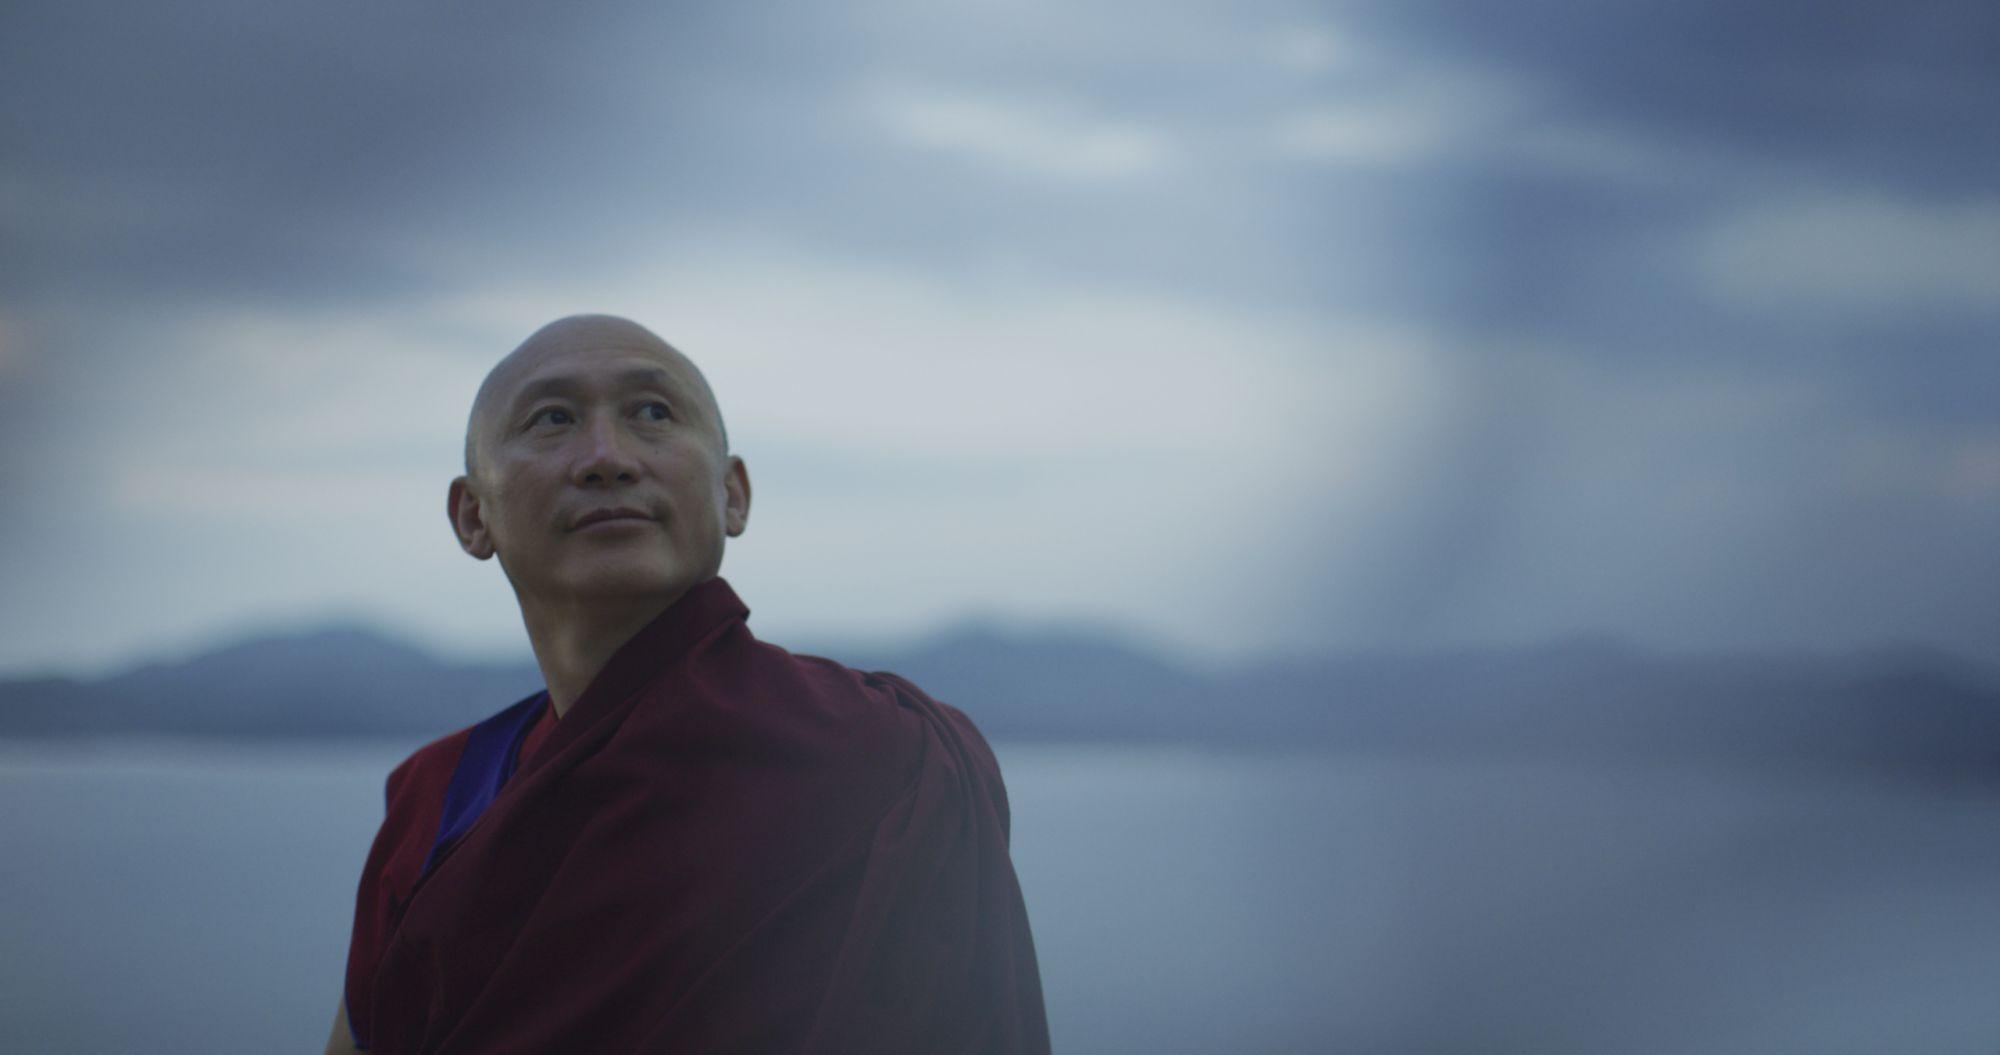 知名佛教僧侶及禪修大師 Geshe YongDong(Geshe La)。